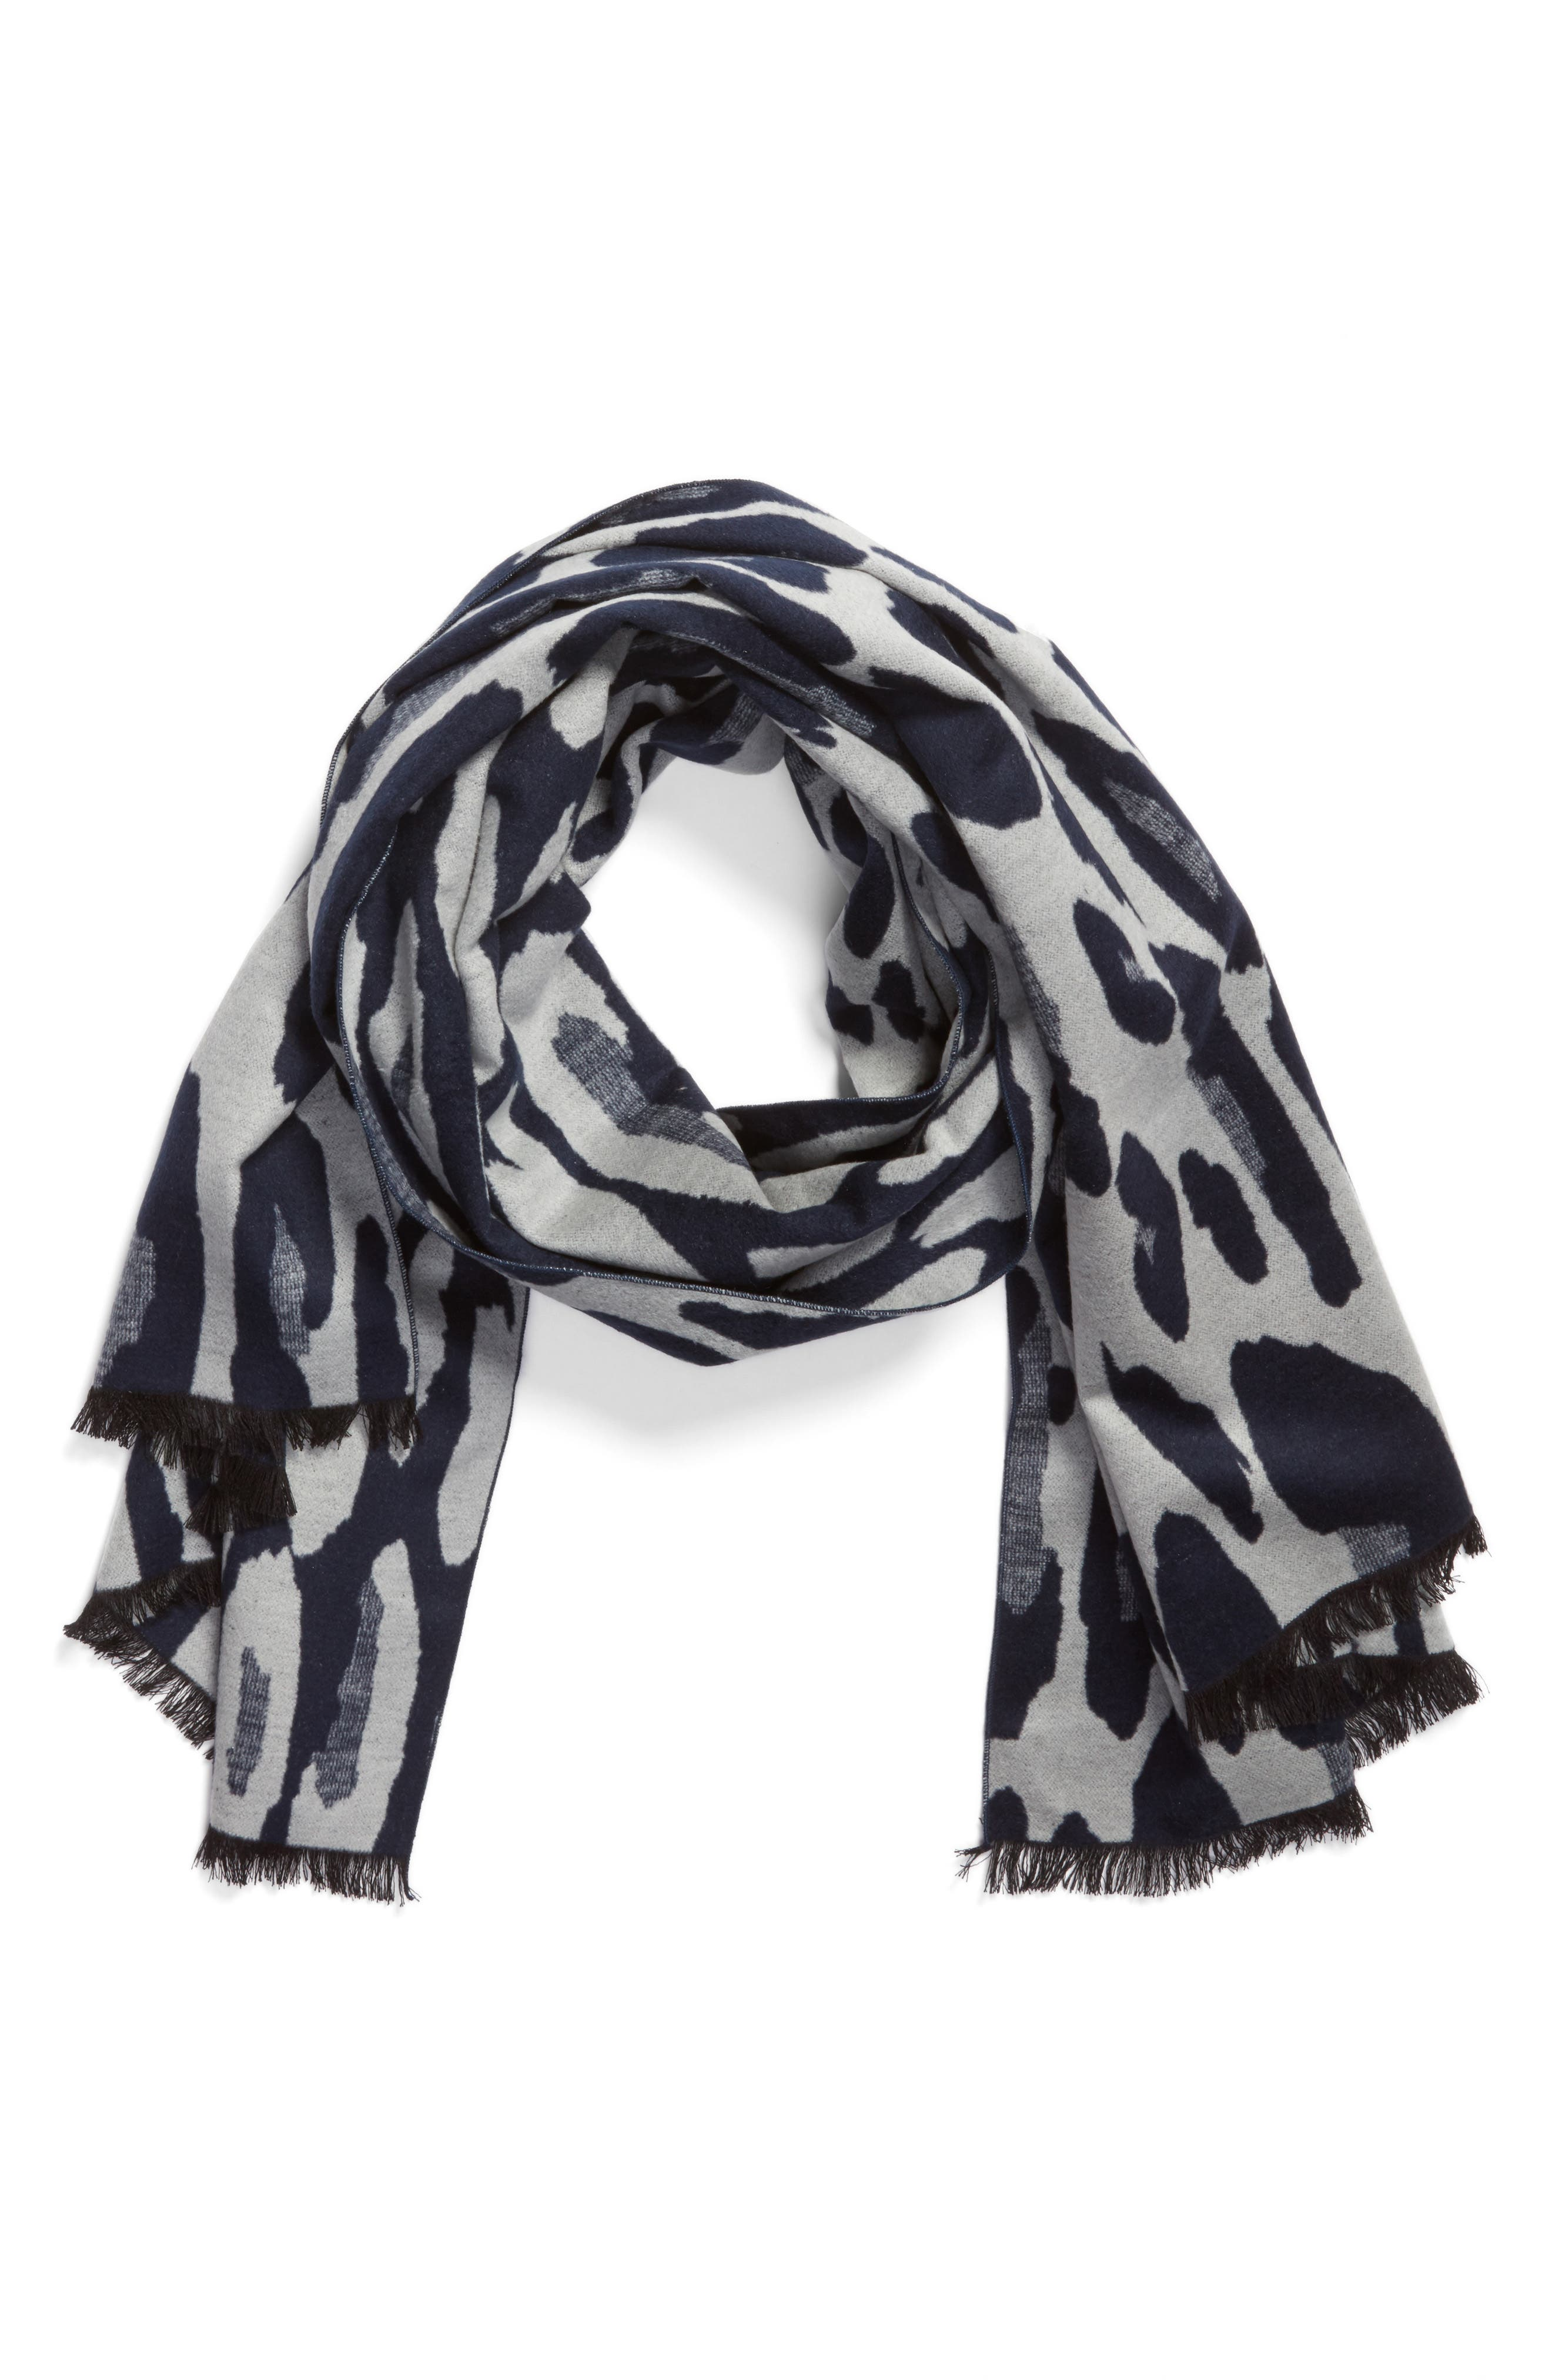 Alternate Image 1 Selected - Helen Kaminski Leopard Print Brushed Silk Scarf